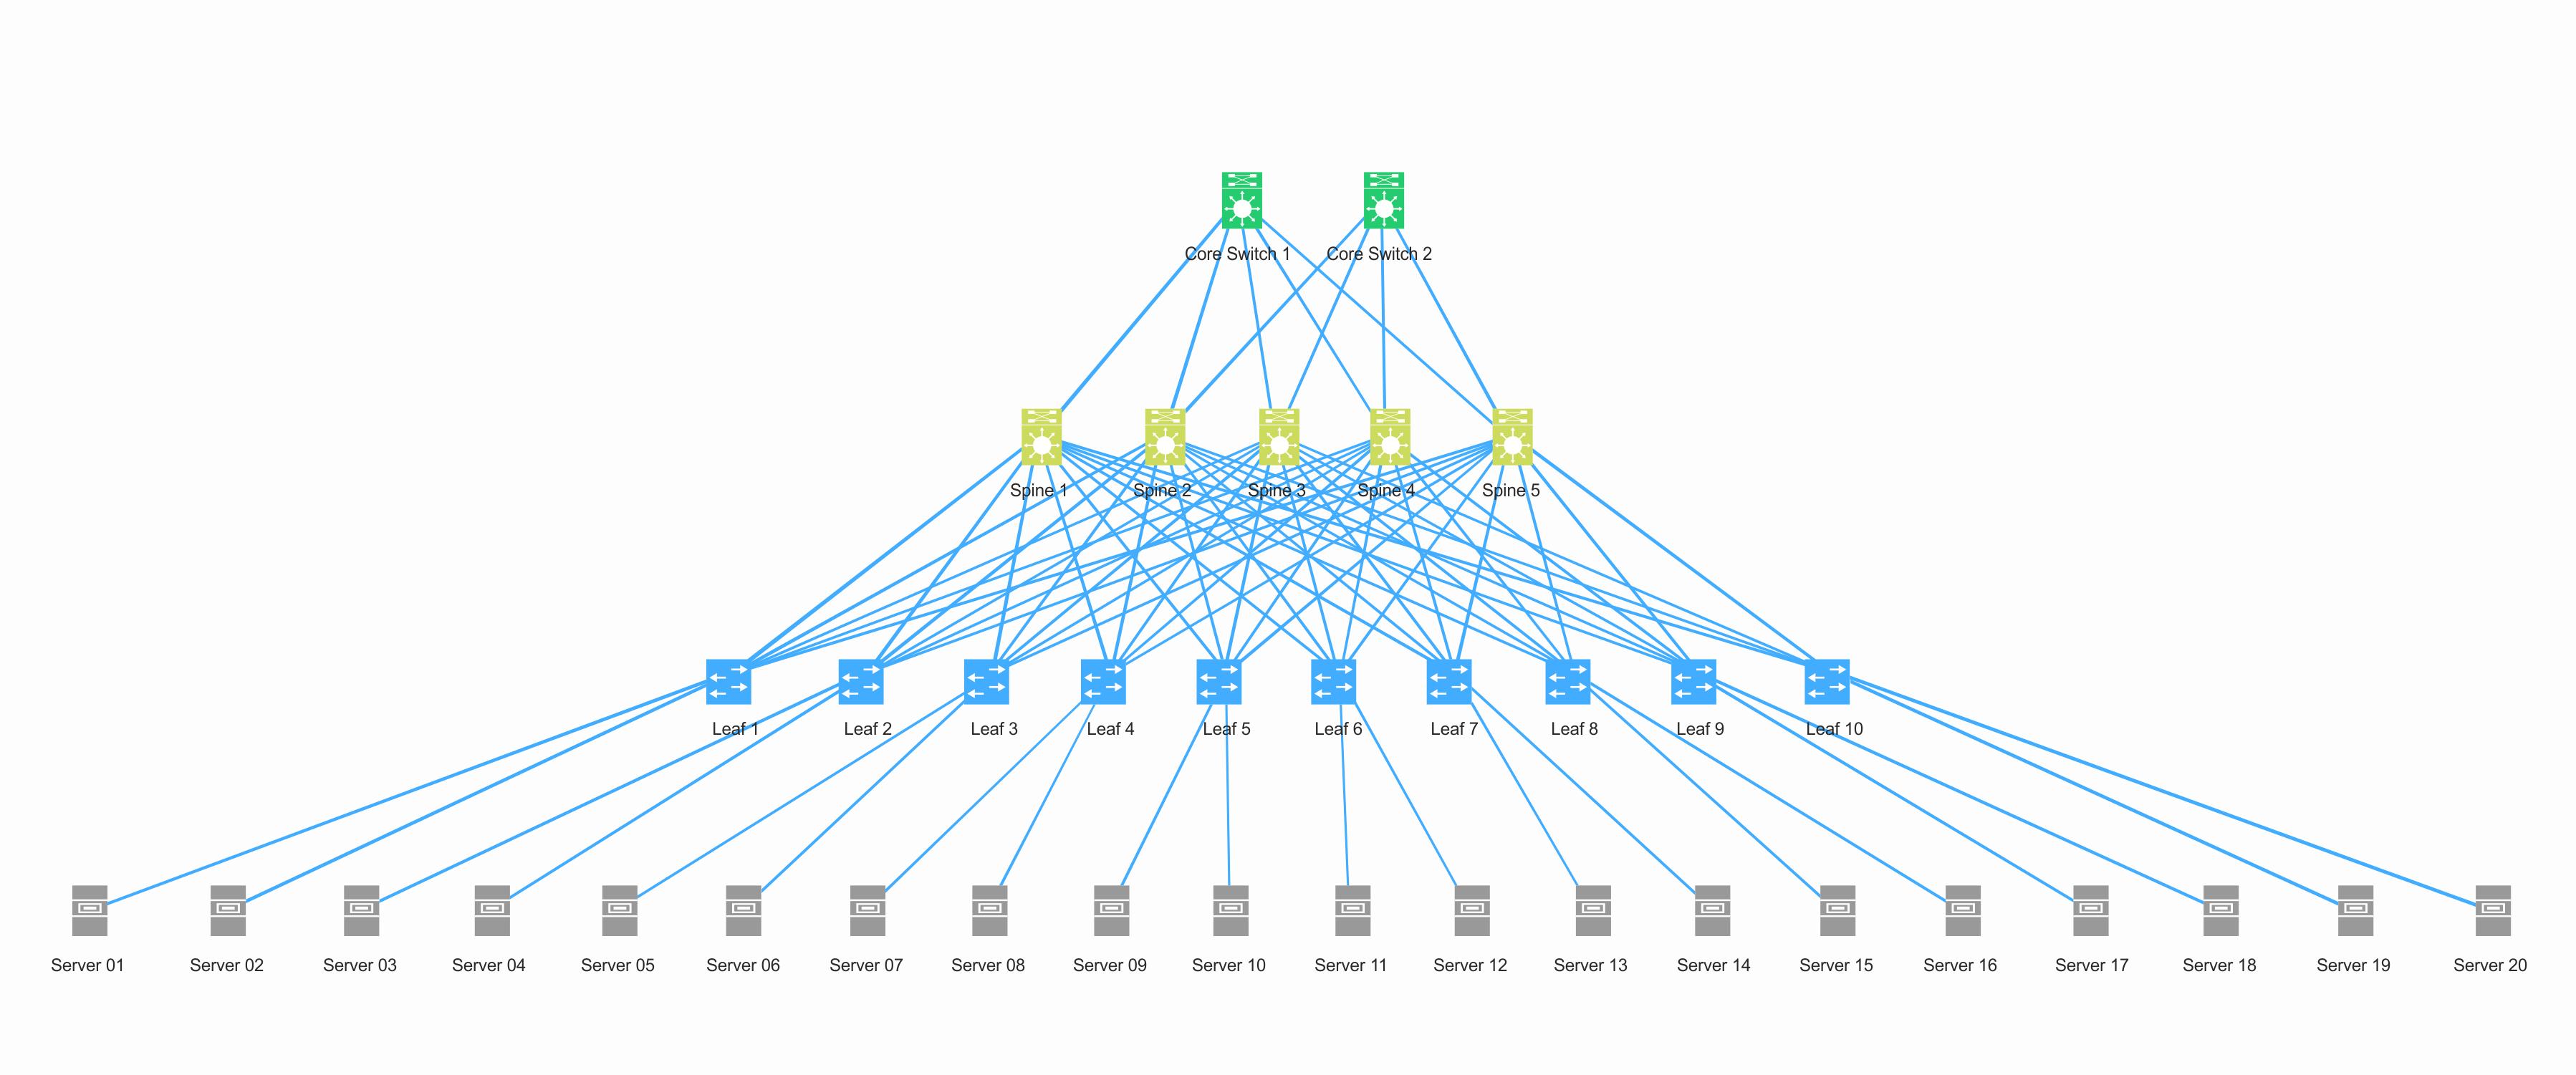 lighty io UI: Network Topology Visualization Component